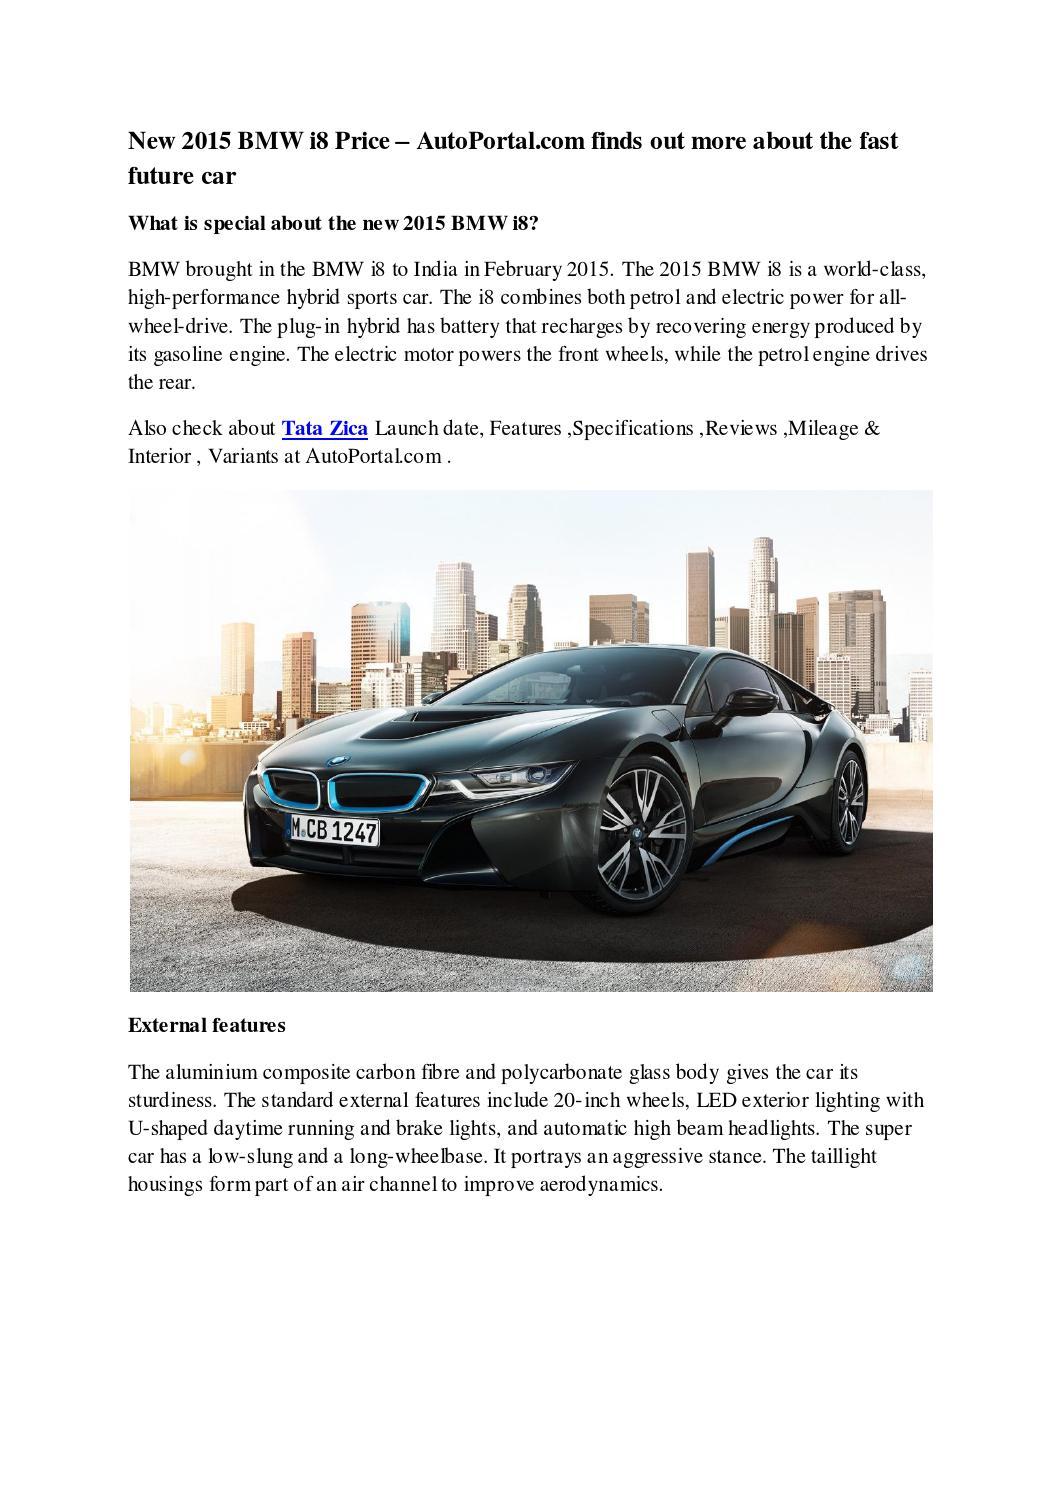 Bmw I8 Hybrid Electric Car Price In India Bmw I8 Price In India